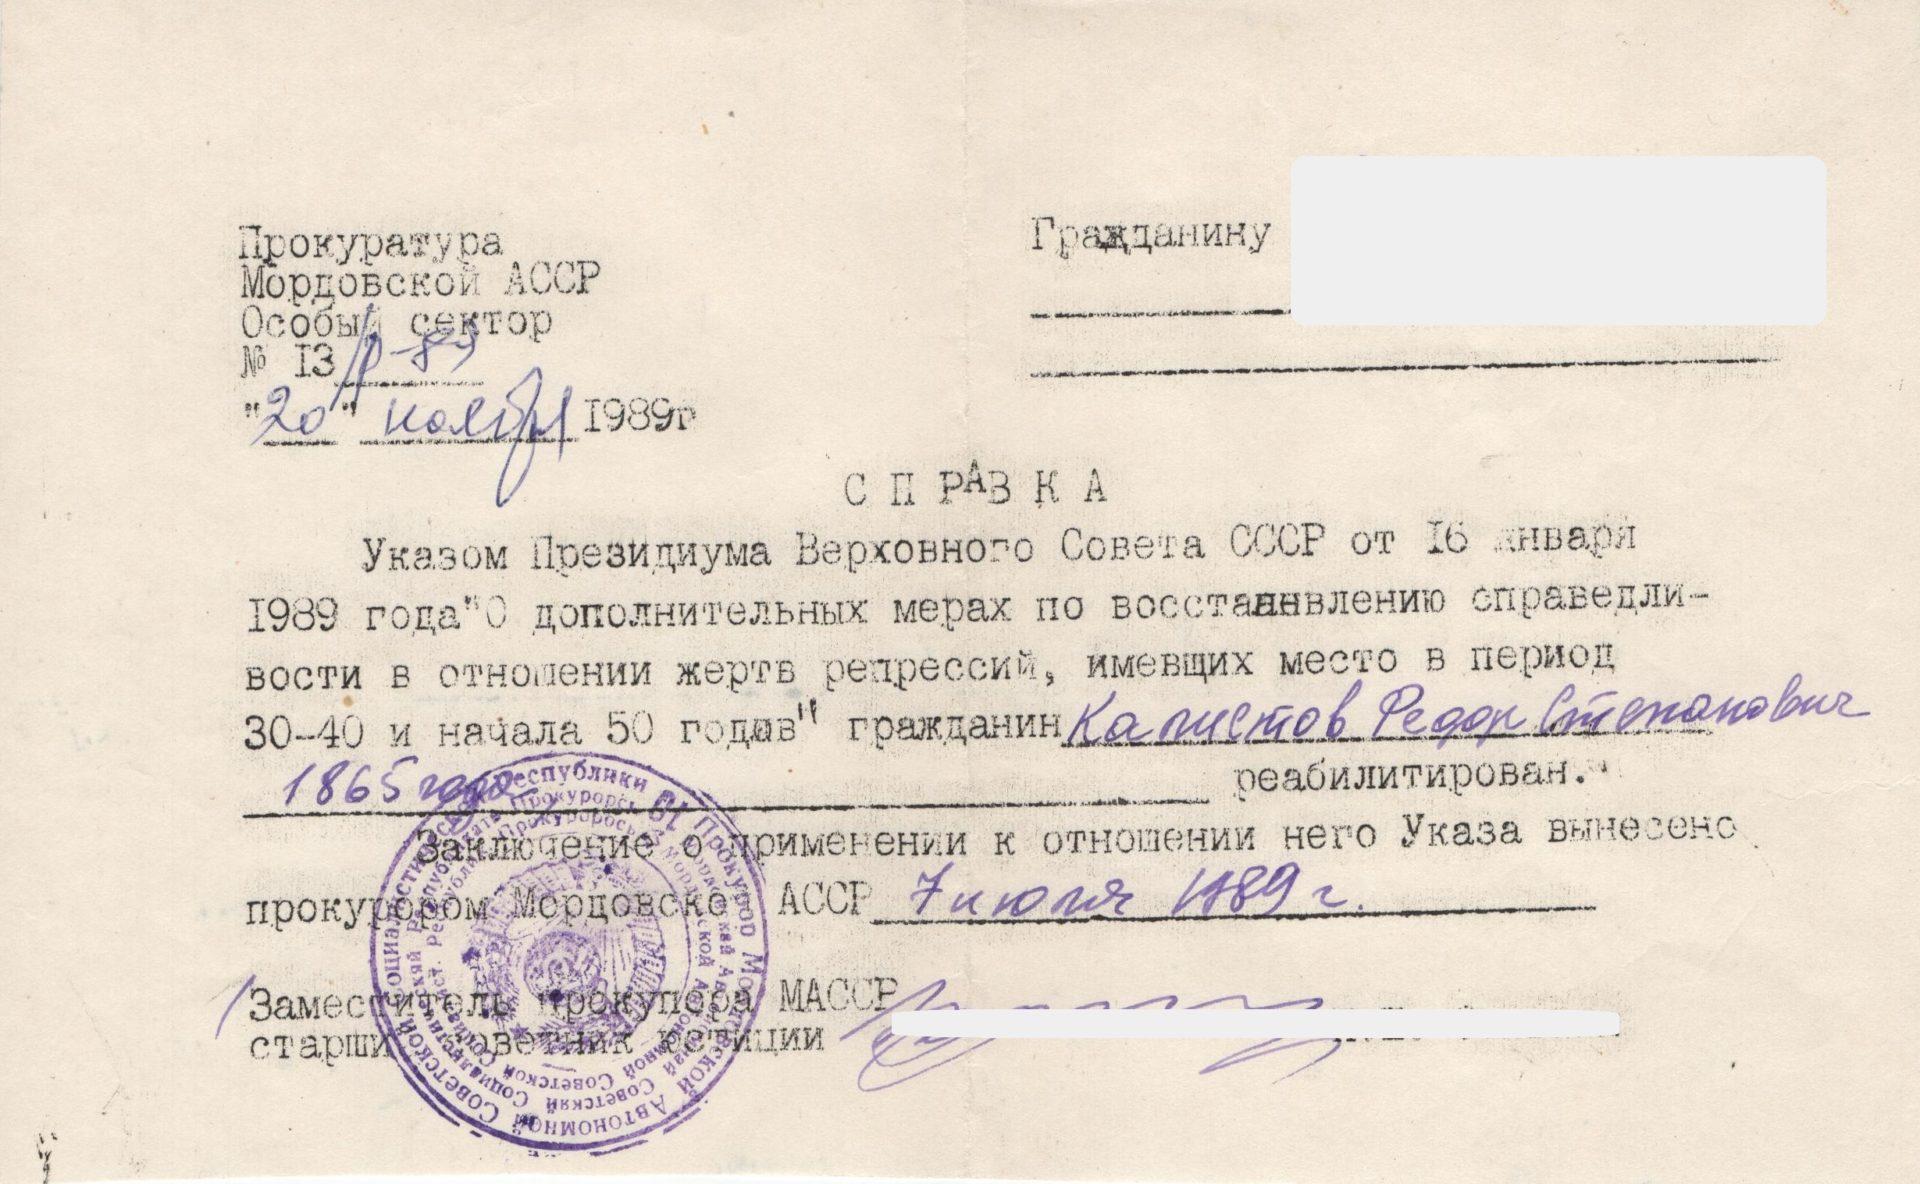 Каллистов Федор Степанович реабилитирован Указом Президиума Верховного Совета СССР